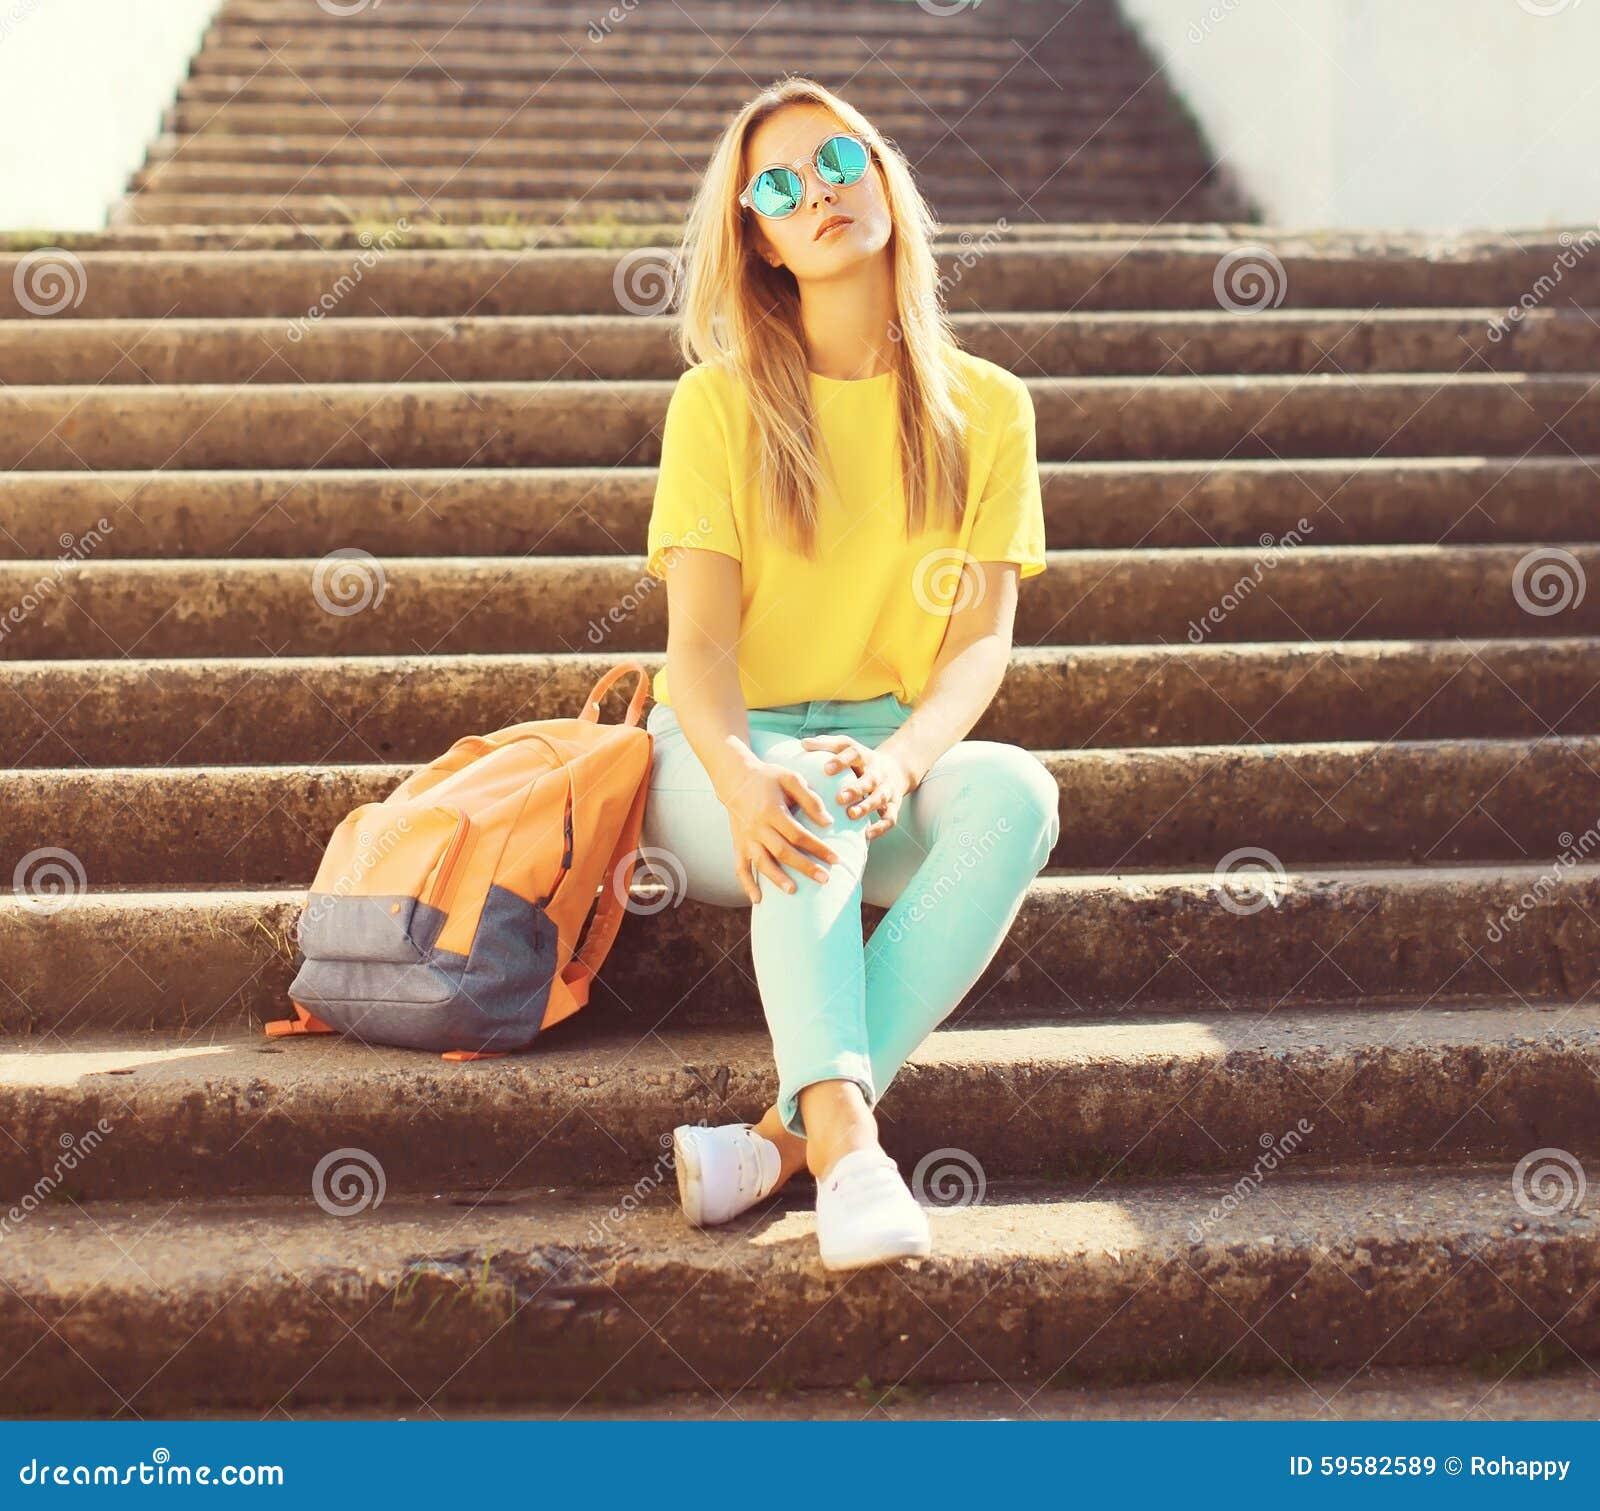 Fashion style Dresses Turtleneck for lady